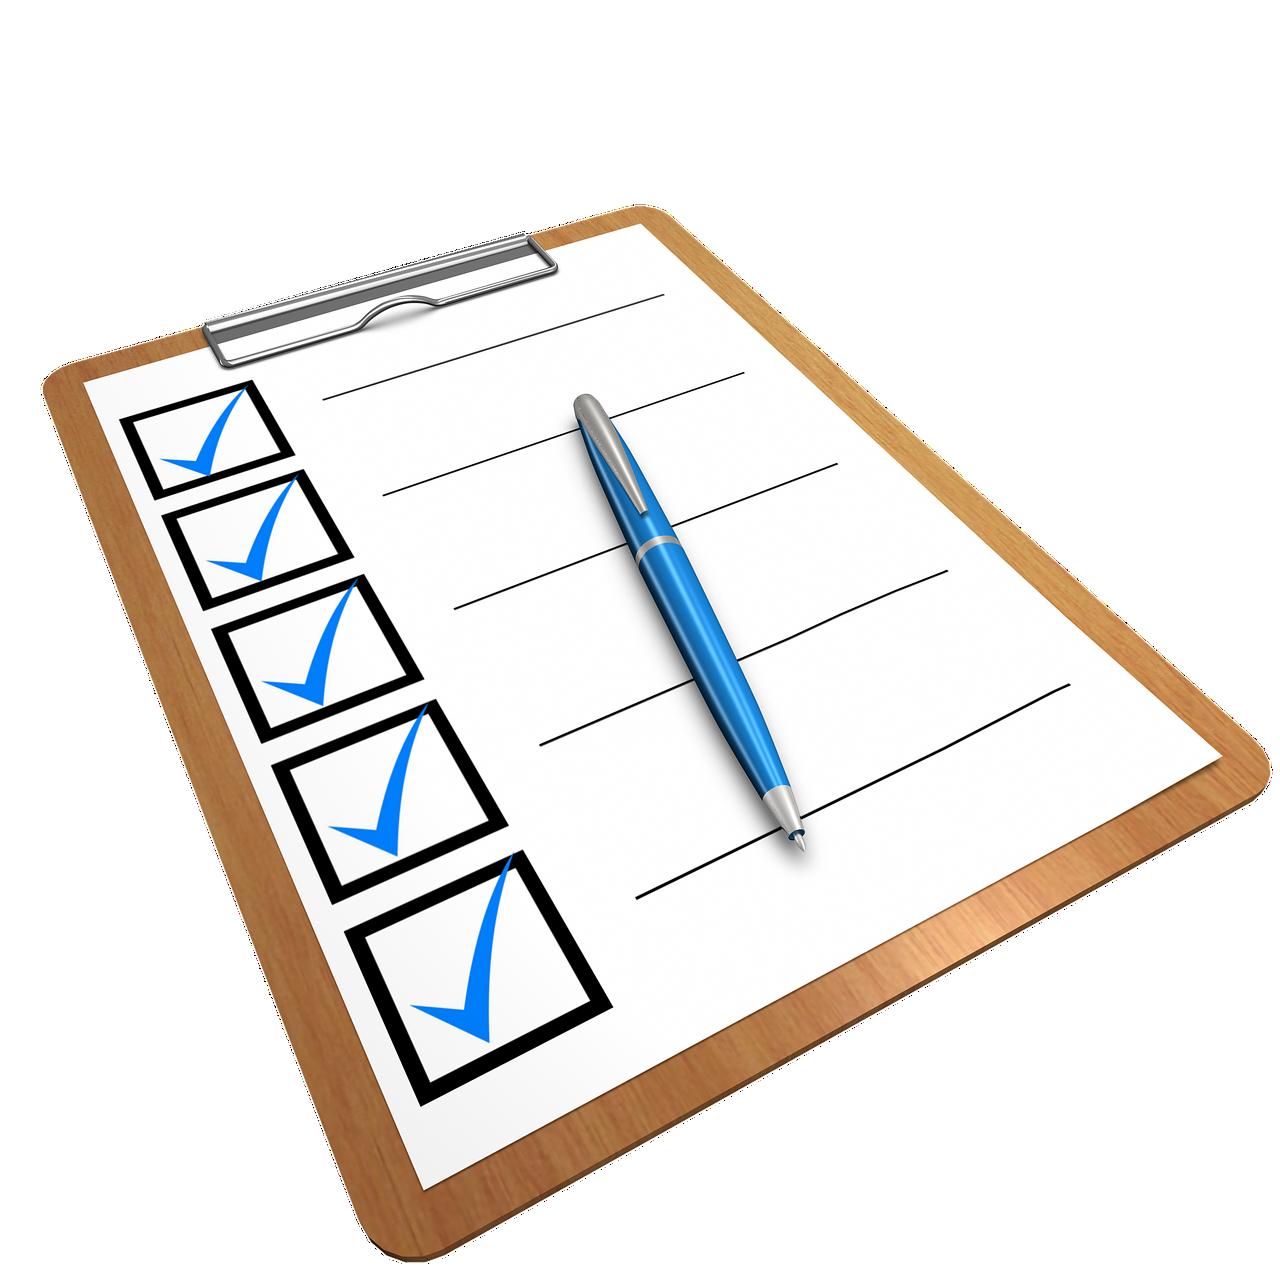 Verificar los programas de cumplimiento. Legal Compliance